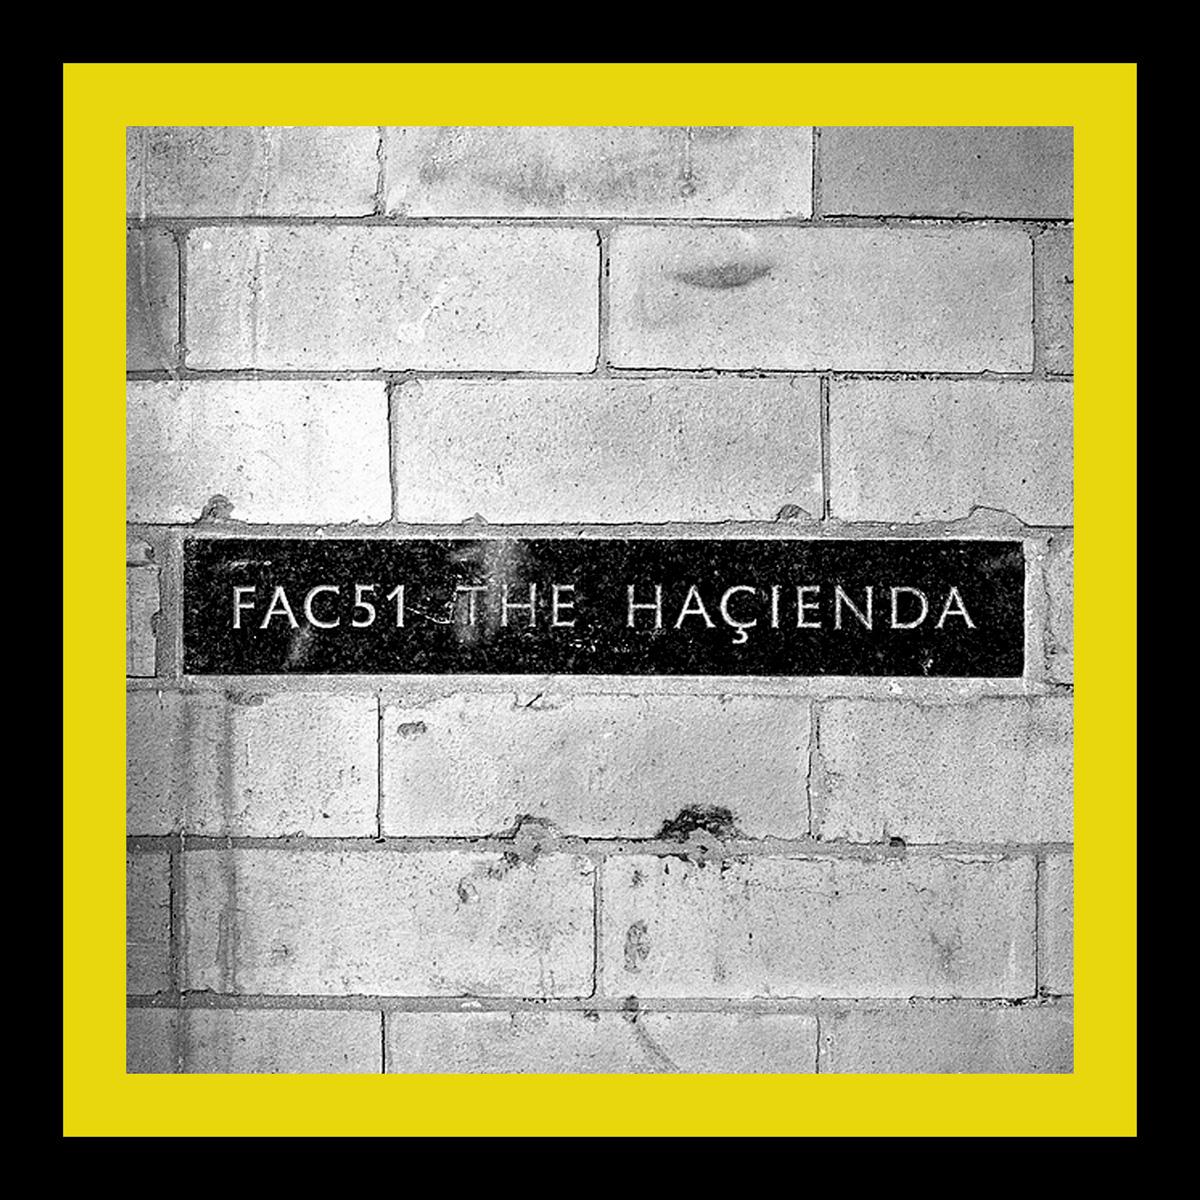 "Hacienda Club Original FAC51 Wall Manchester 20""x20"" £195.00.  30""x30"" £300.00  40""x40"" £495.00"